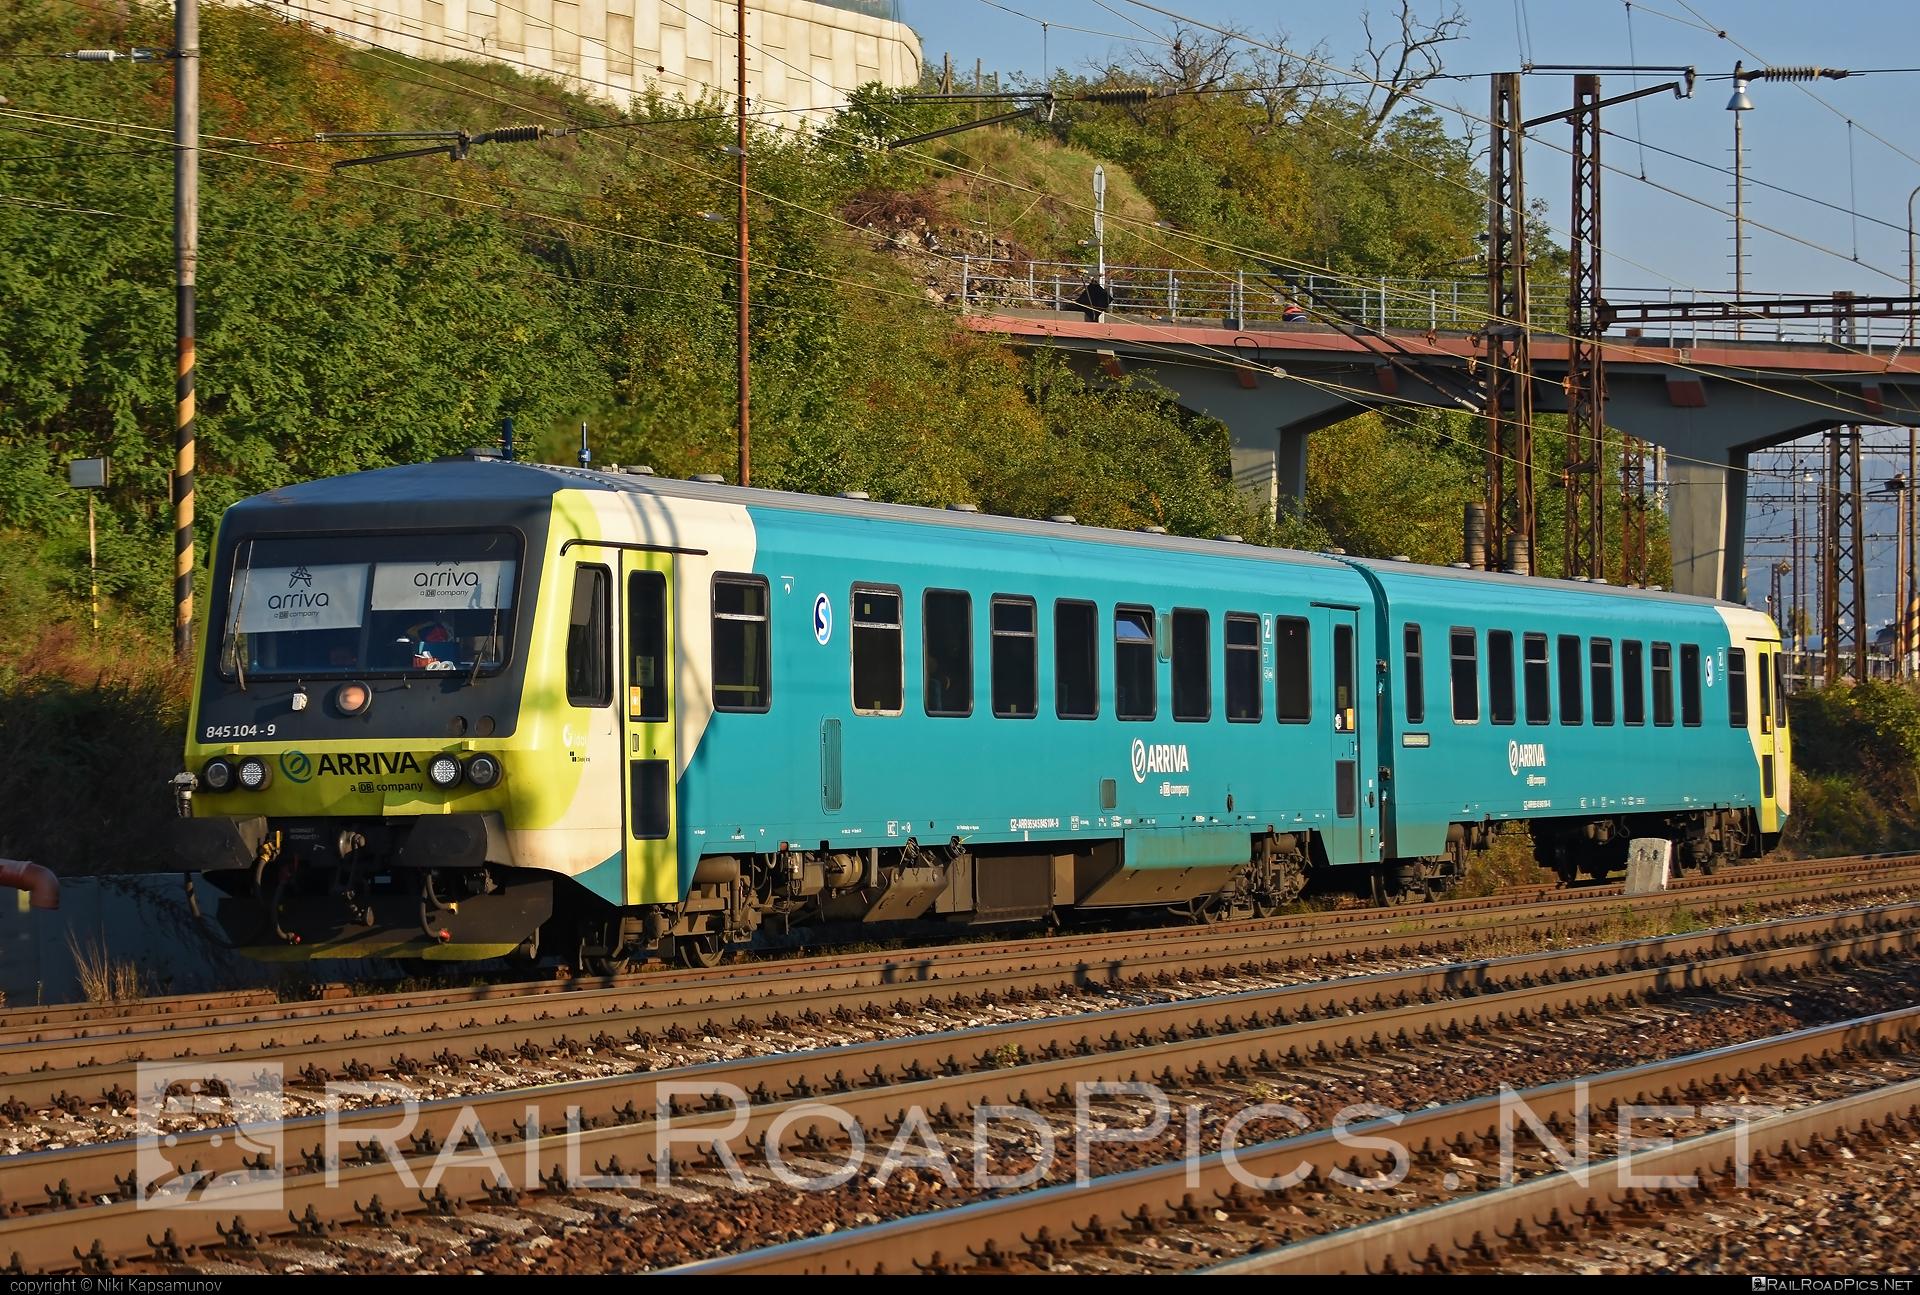 Düwag DB Class 628 - 845 104-9 operated by ARRIVA vlaky s.r.o. #arriva #arrivavlaky #arrivavlakysro #dbclass628 #duewag #duewag628 #duwag #duwag628